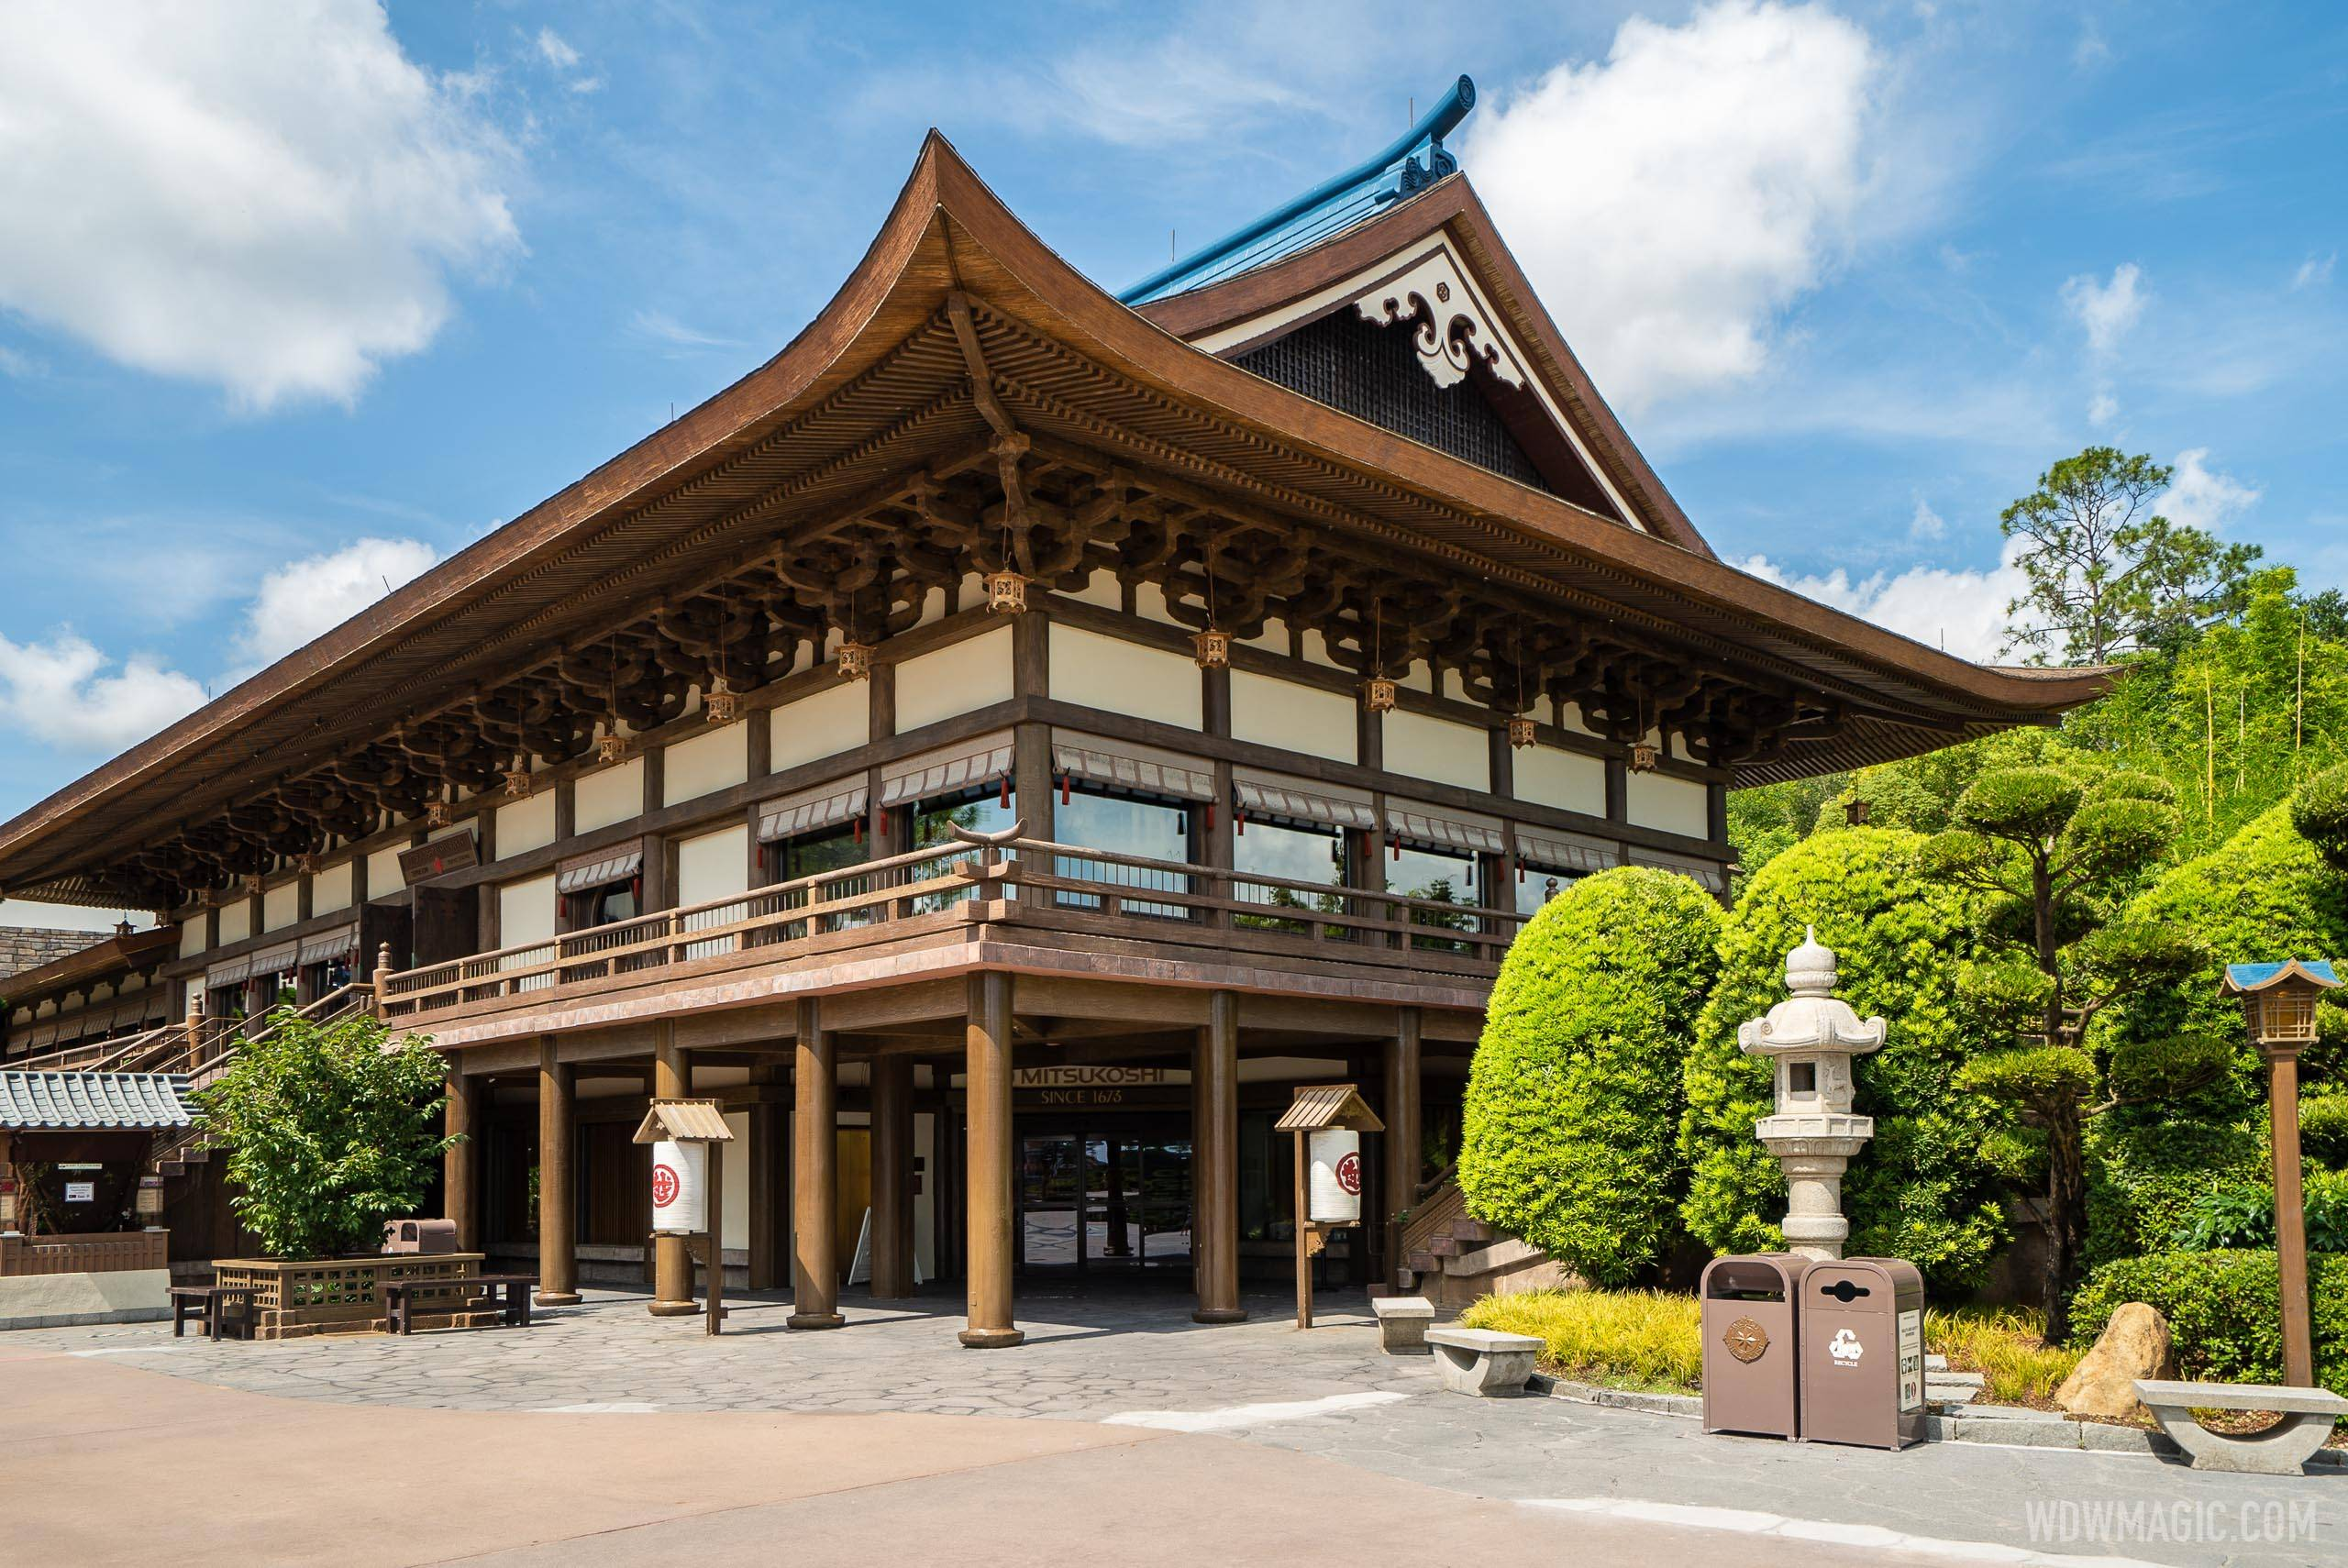 Teppan Edo exterior